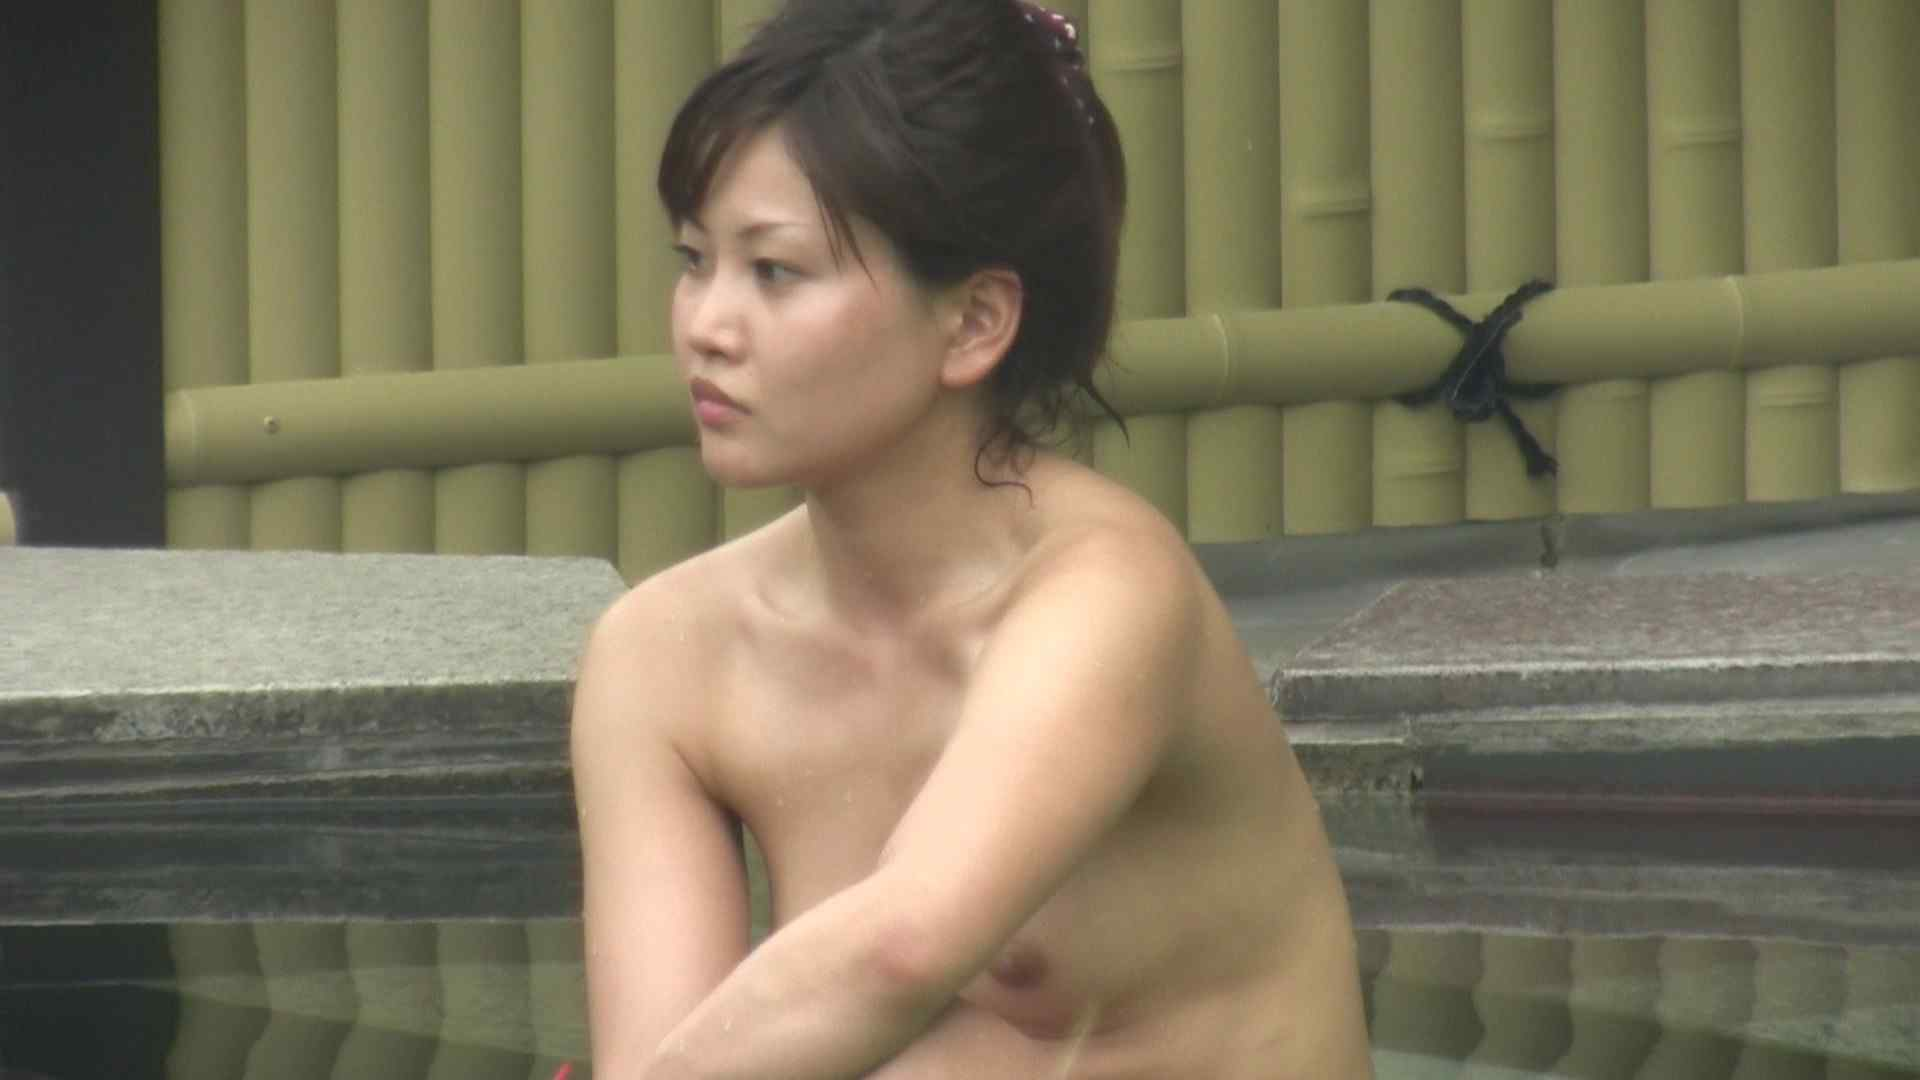 Aquaな露天風呂Vol.125 露天  88連発 16